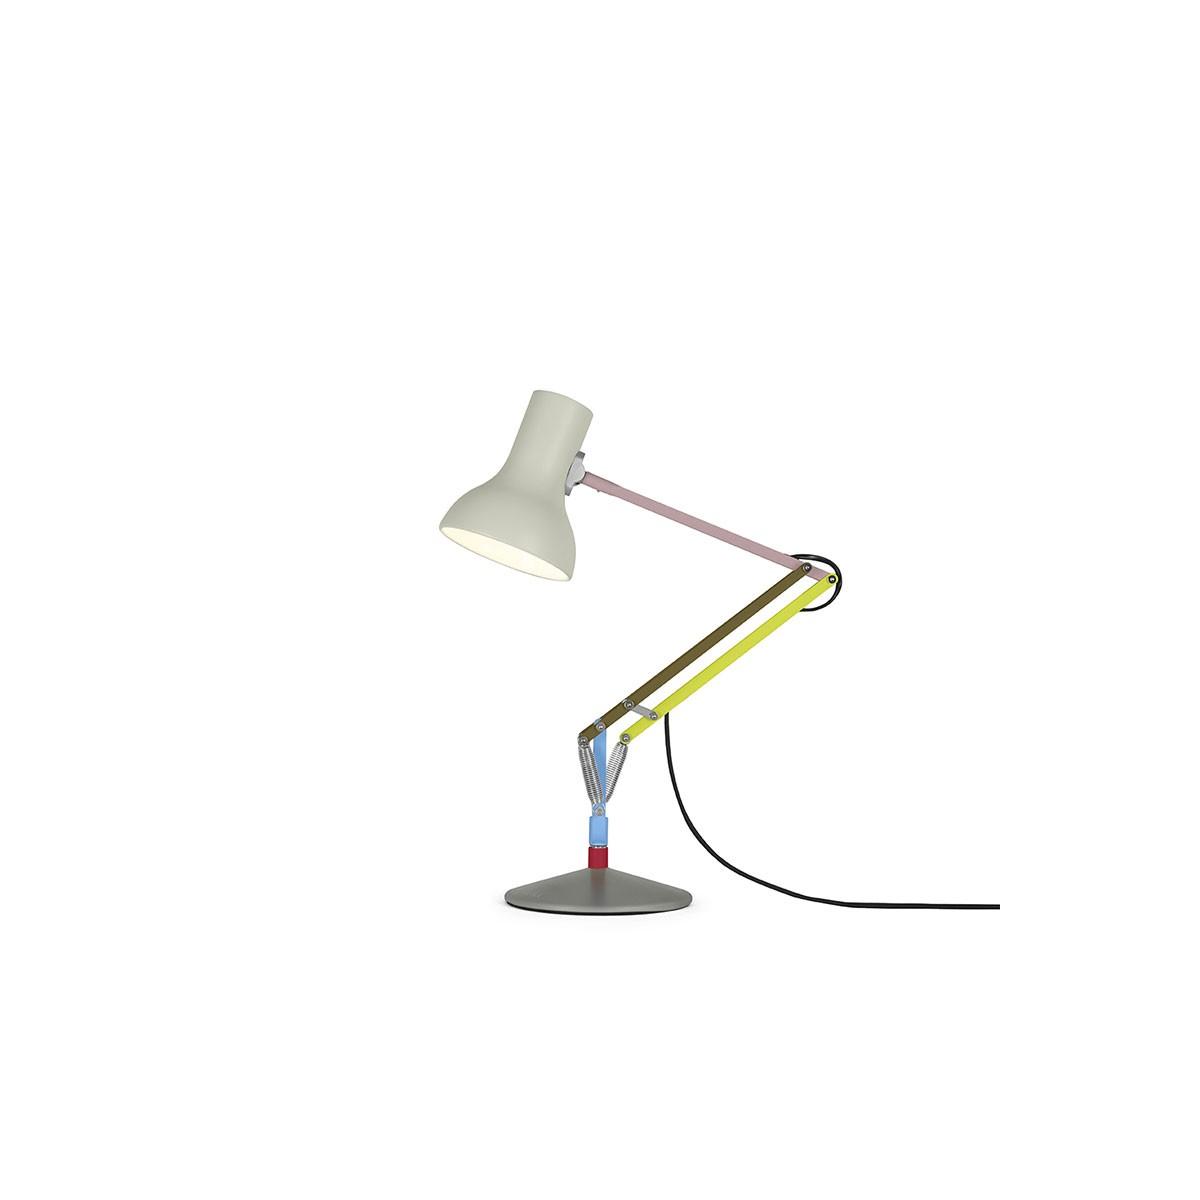 carta da parati a righe firmata da paul smith per maharam. Anglepoise Lampada Da Tavolo Type 75 Mini Paul Smith